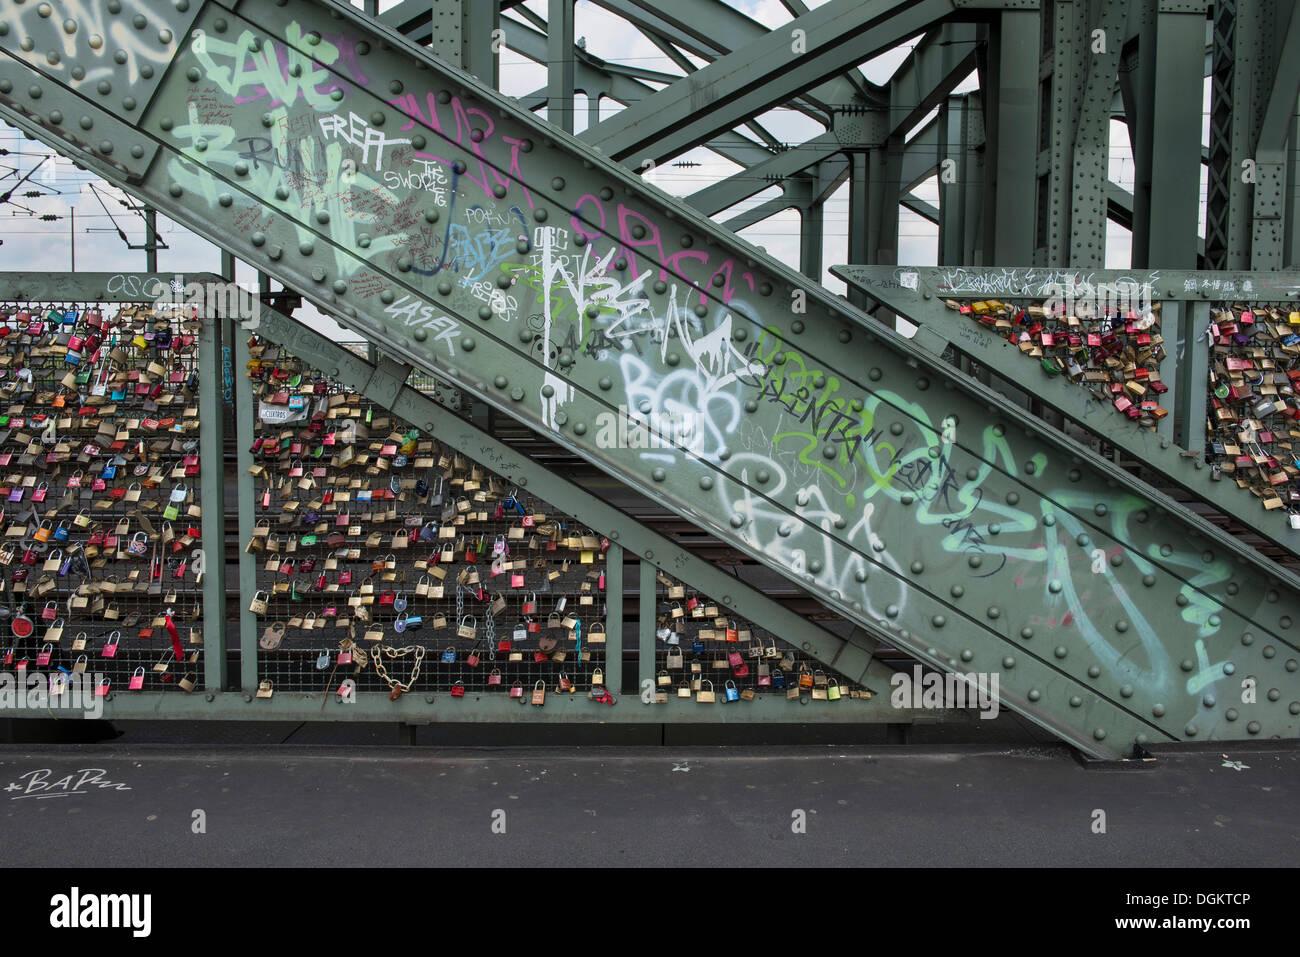 Hohenzollern Bridge, pillars with graffiti and fences full of love padlocks, Cologne, North Rhine-Westphalia - Stock Image